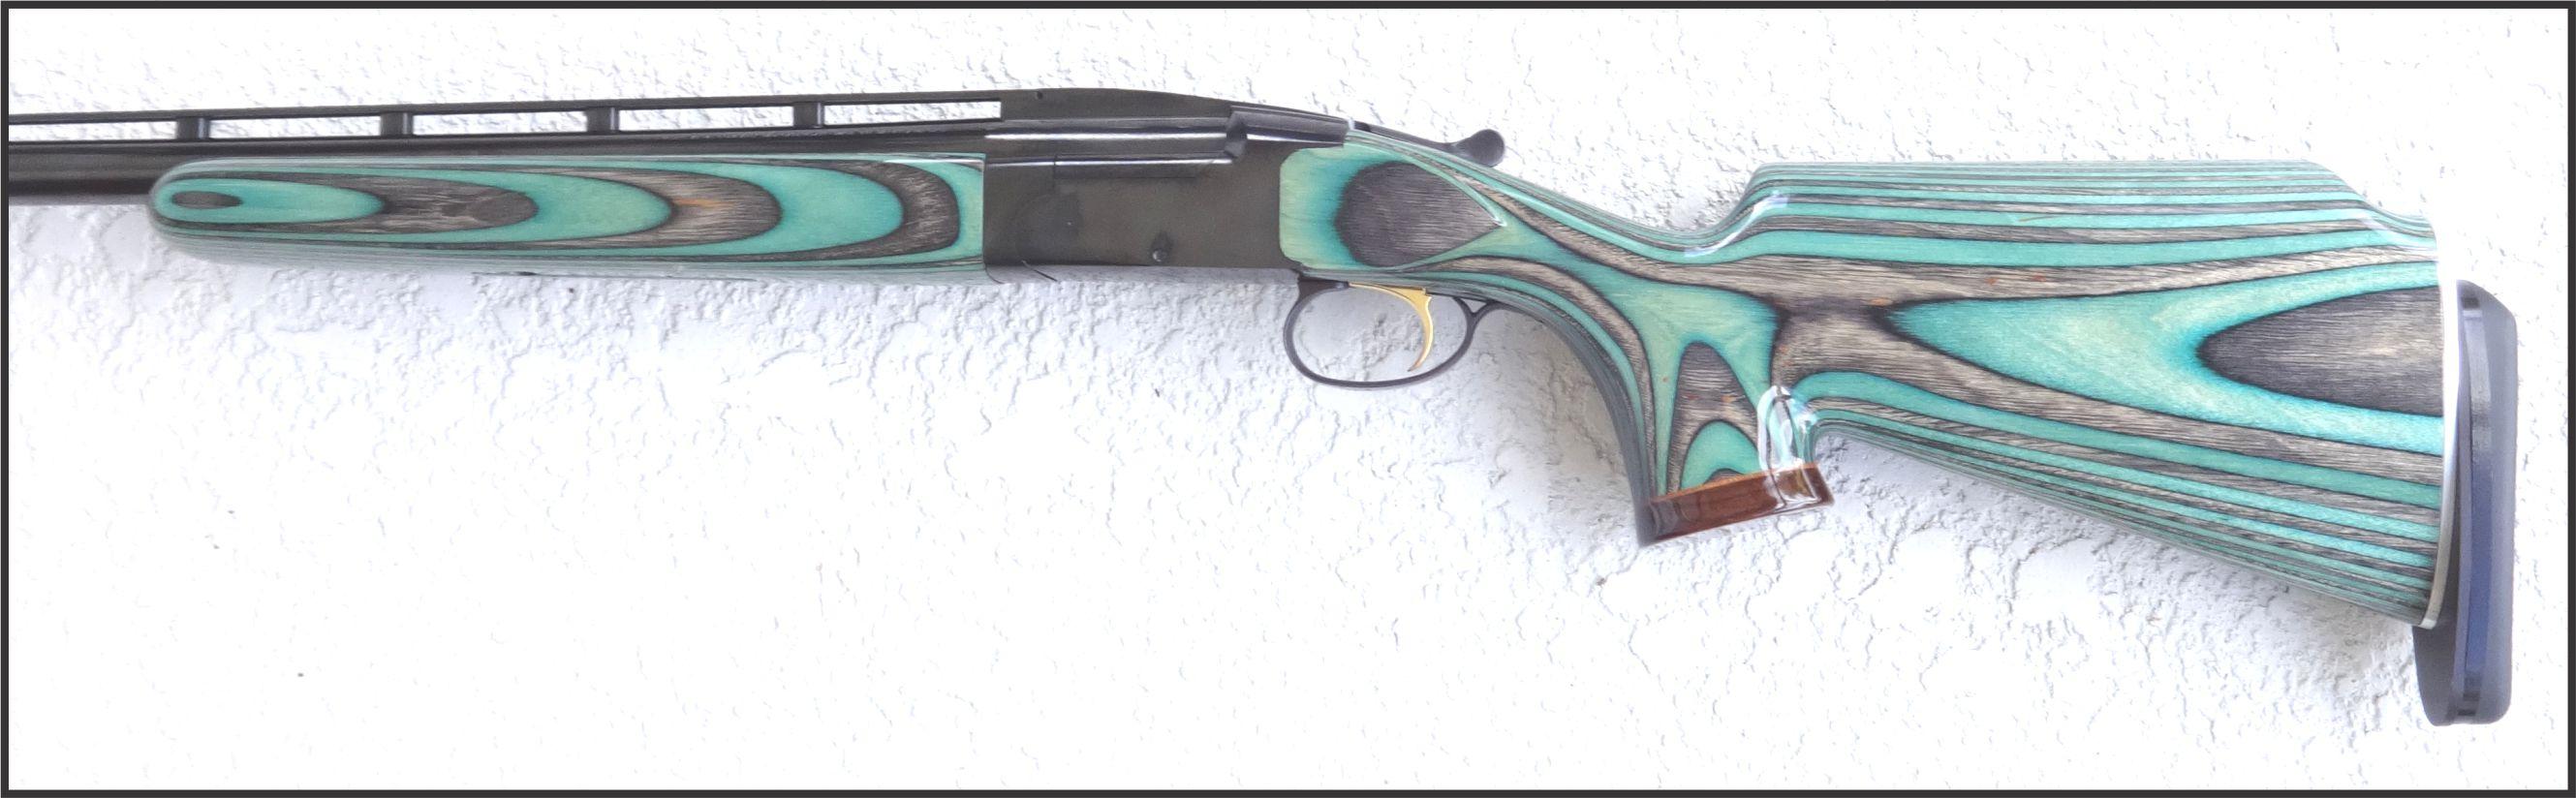 Laminated Gun Stocks